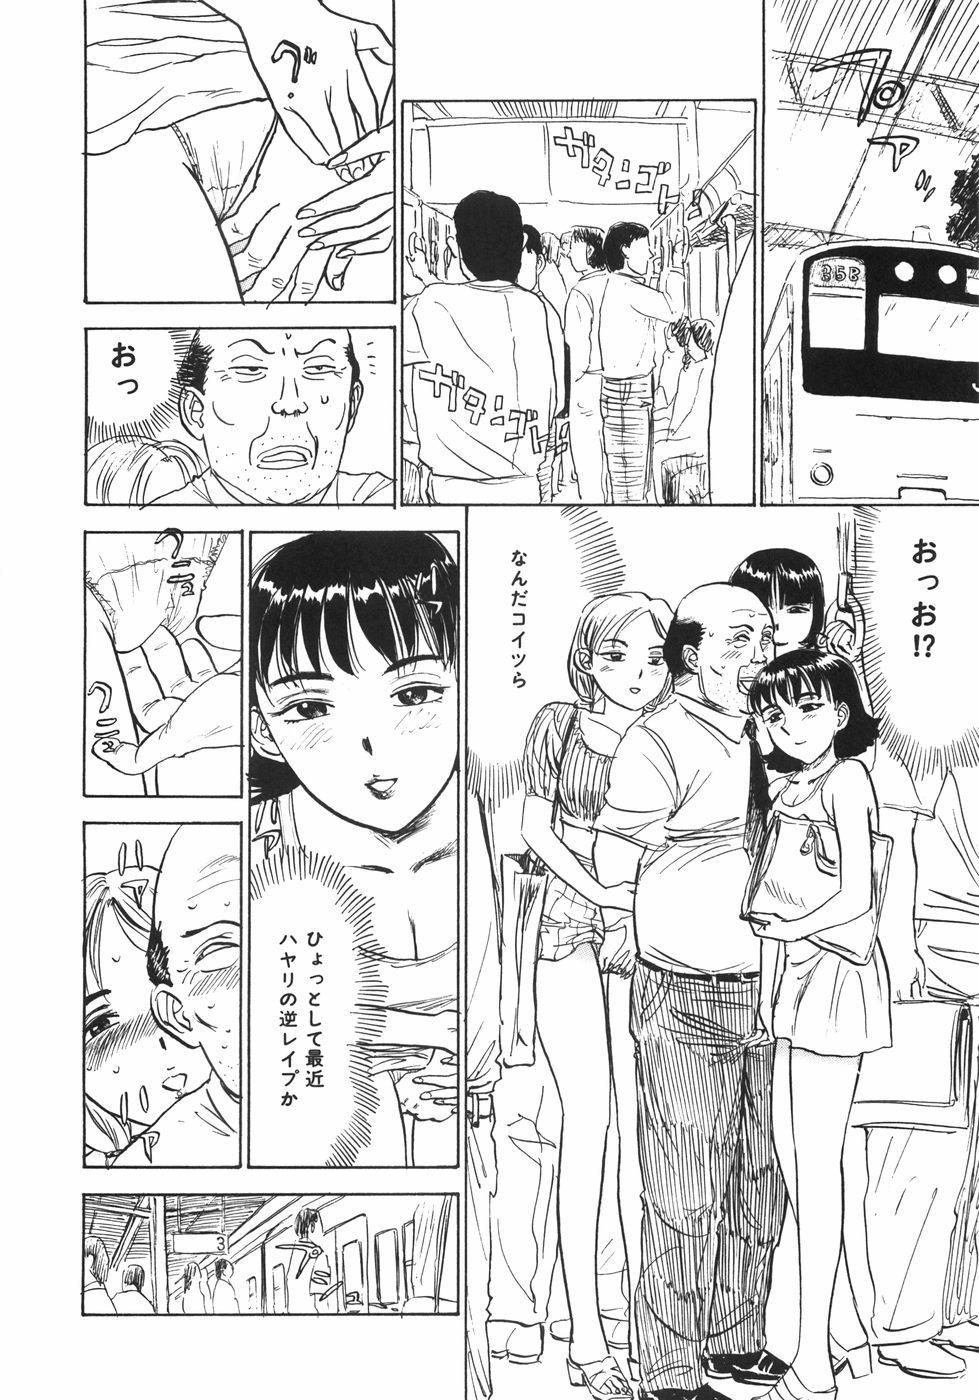 Ningyou no Yakata - The Doll House 58